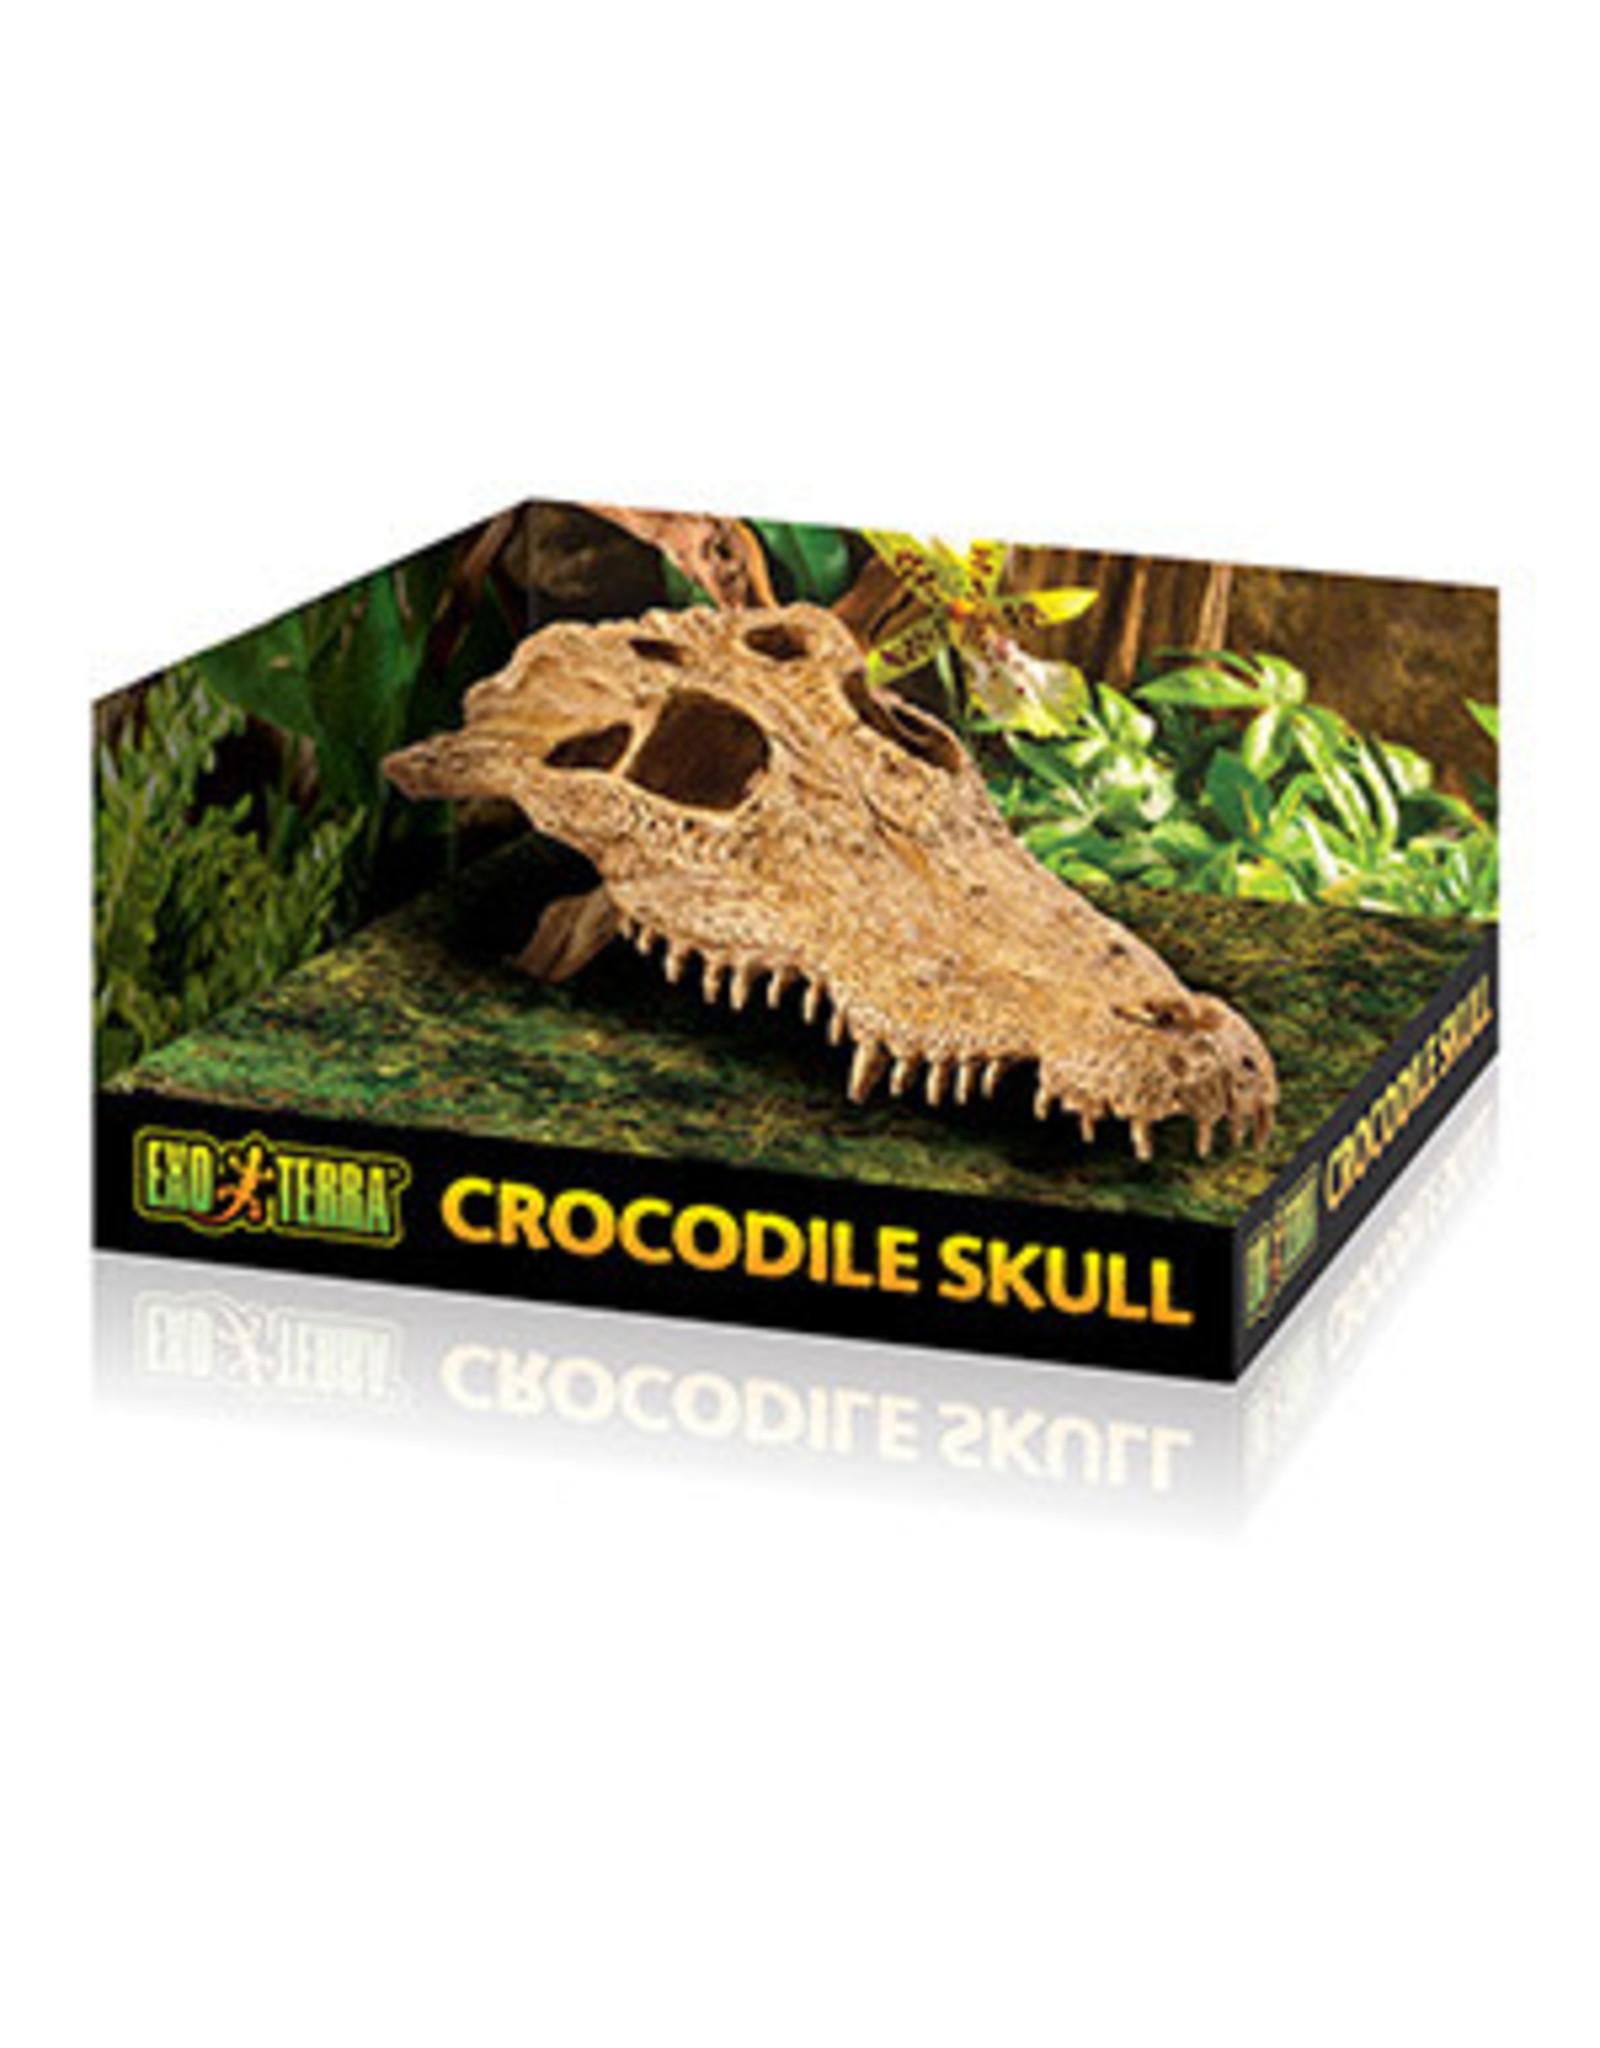 Exo Terra ET Crocodile Skull